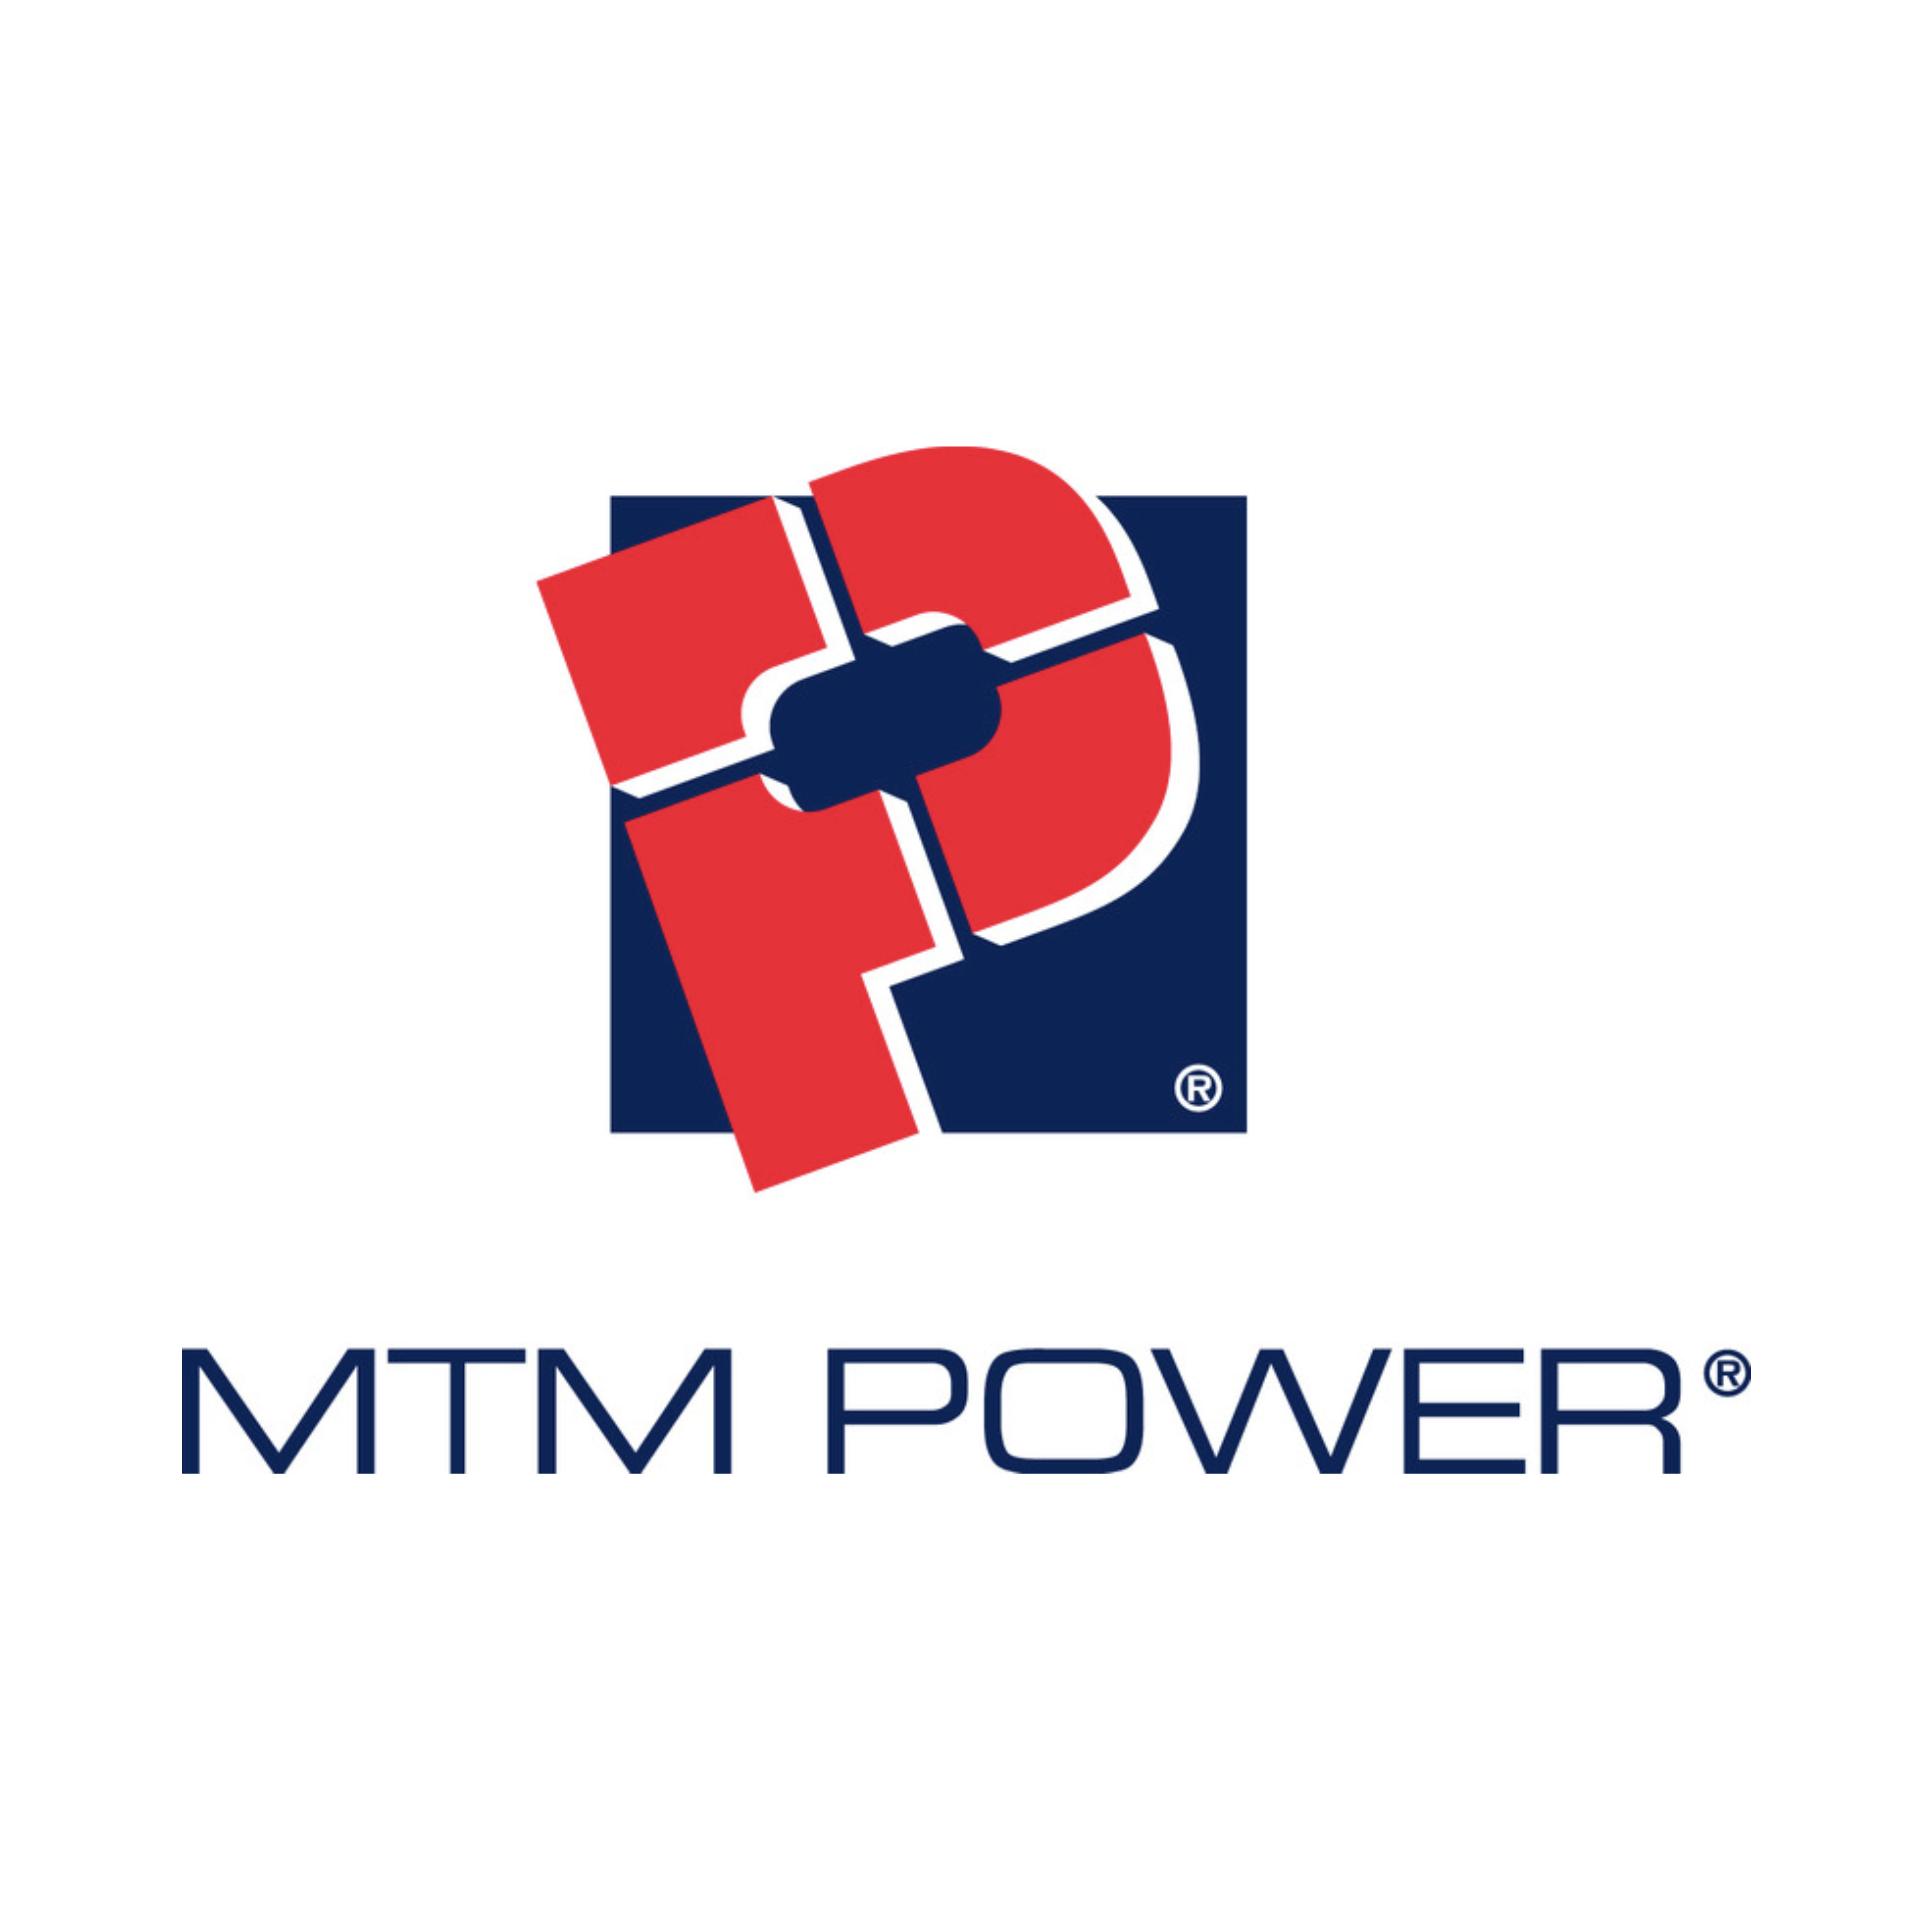 MTM Power® Messtechnik Mellenbach GmbH